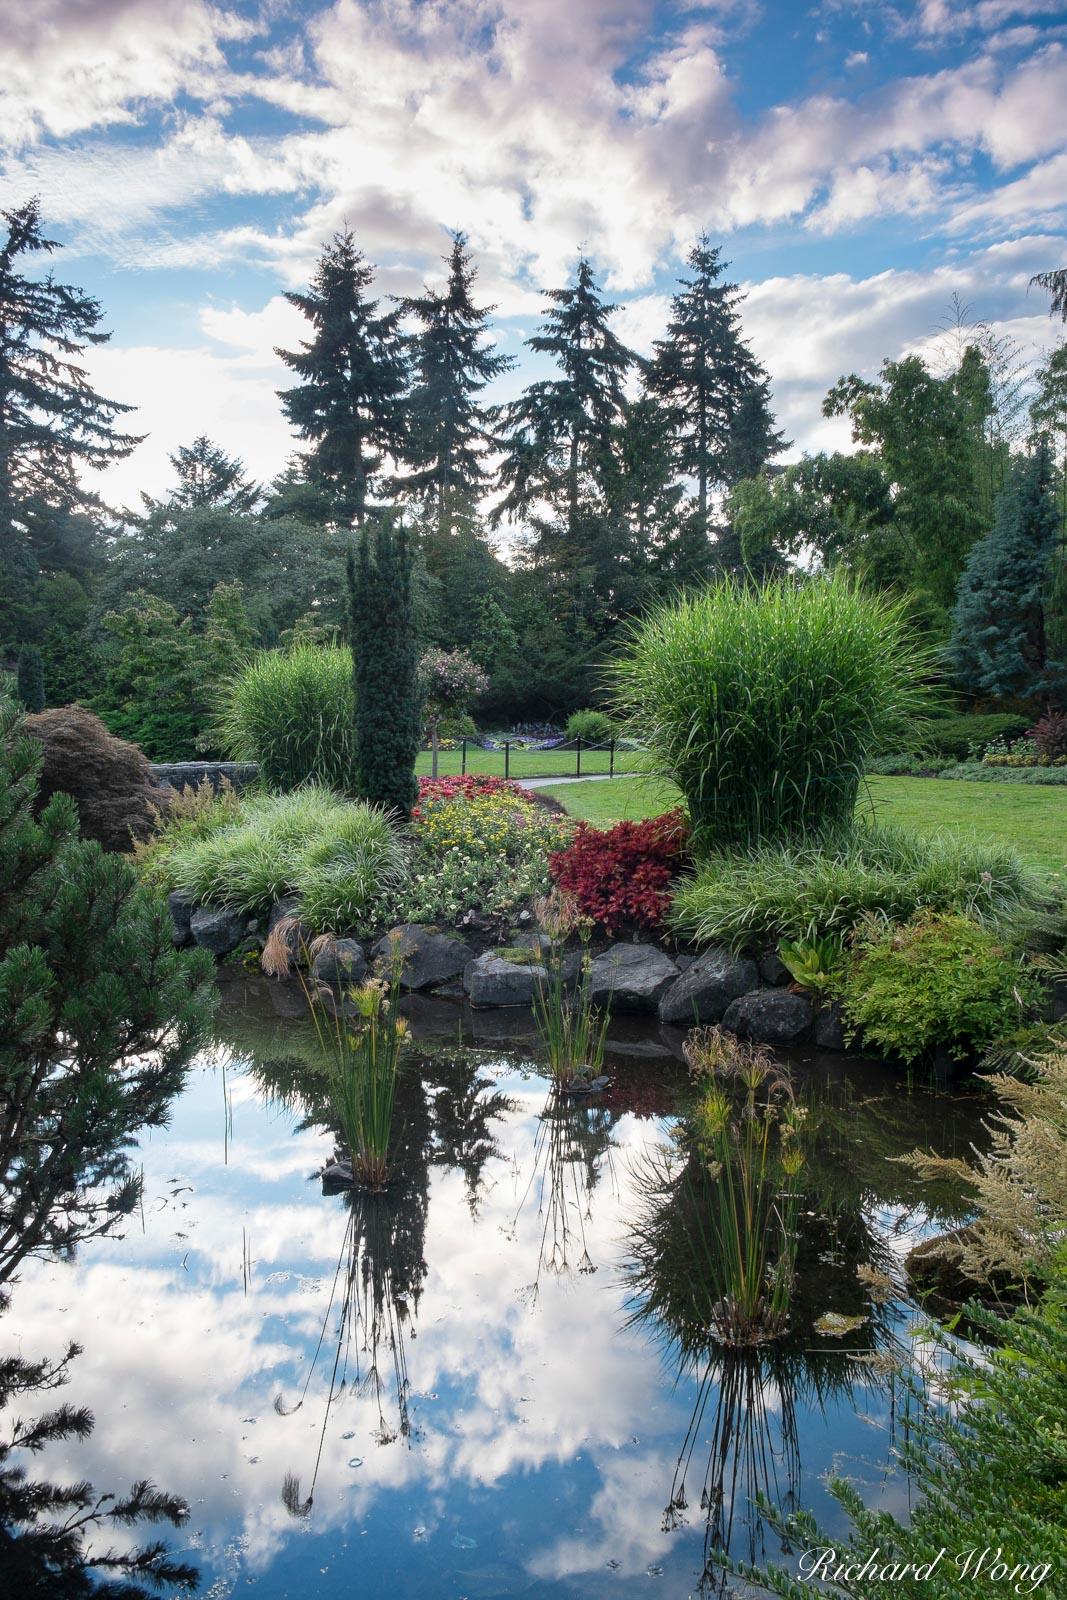 Pond Reflections in Sunken Garden at Queen Elizabeth Park, Vancouver, B.C., photo, photo